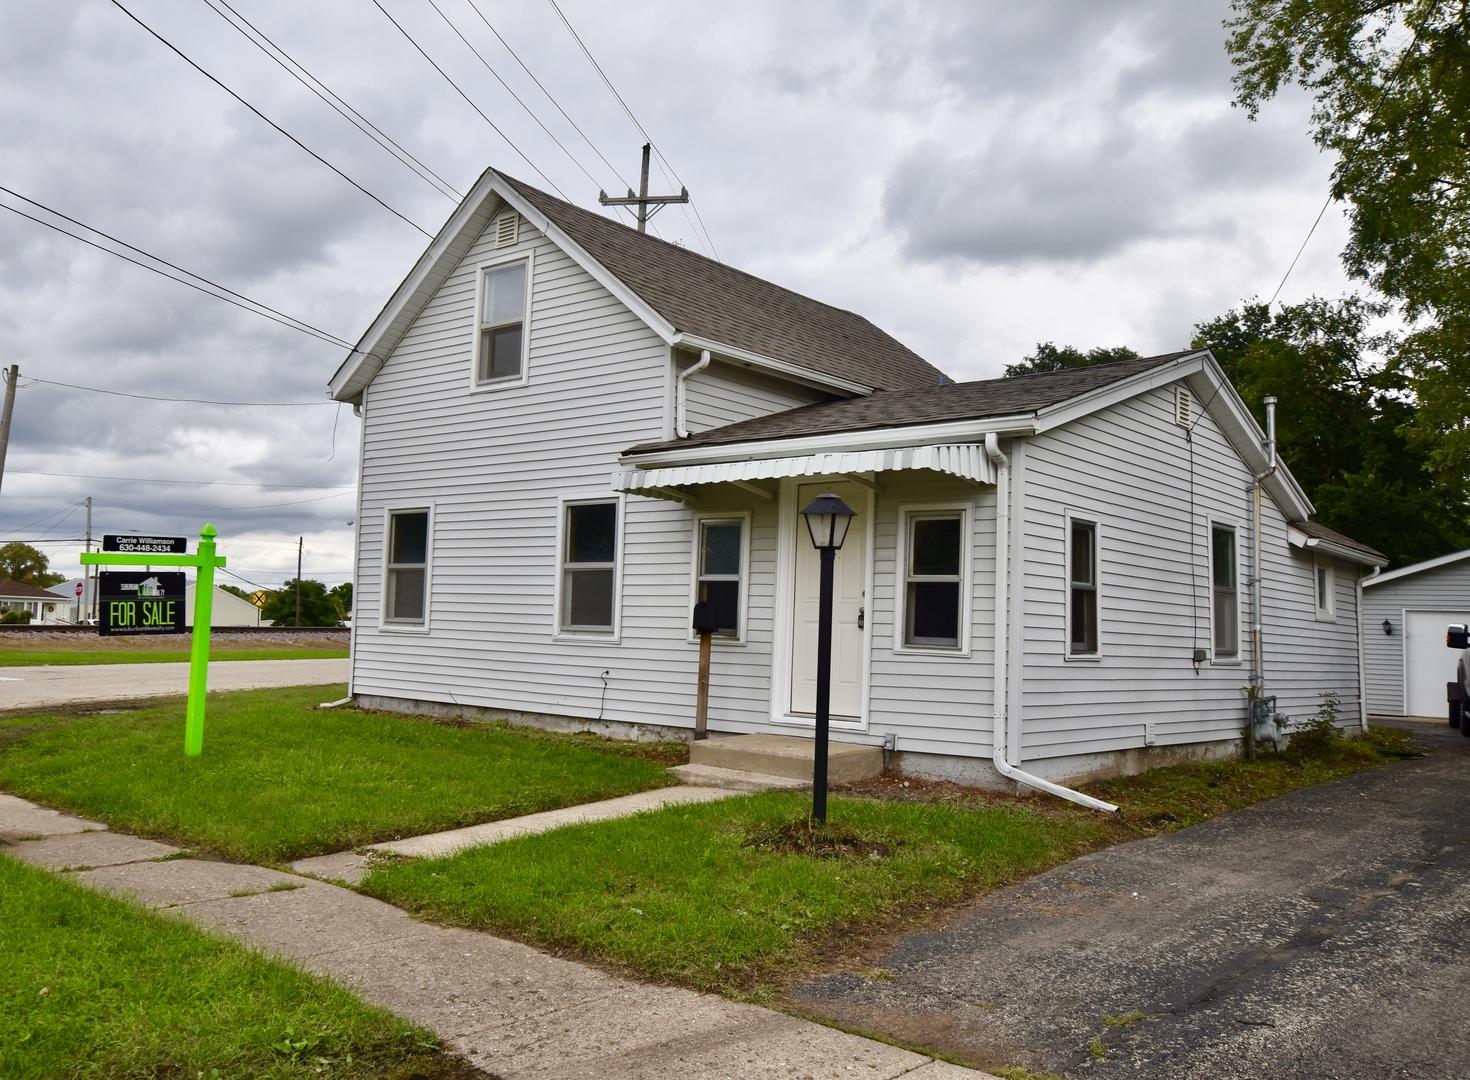 710 5th, Belvidere, Illinois, 61008